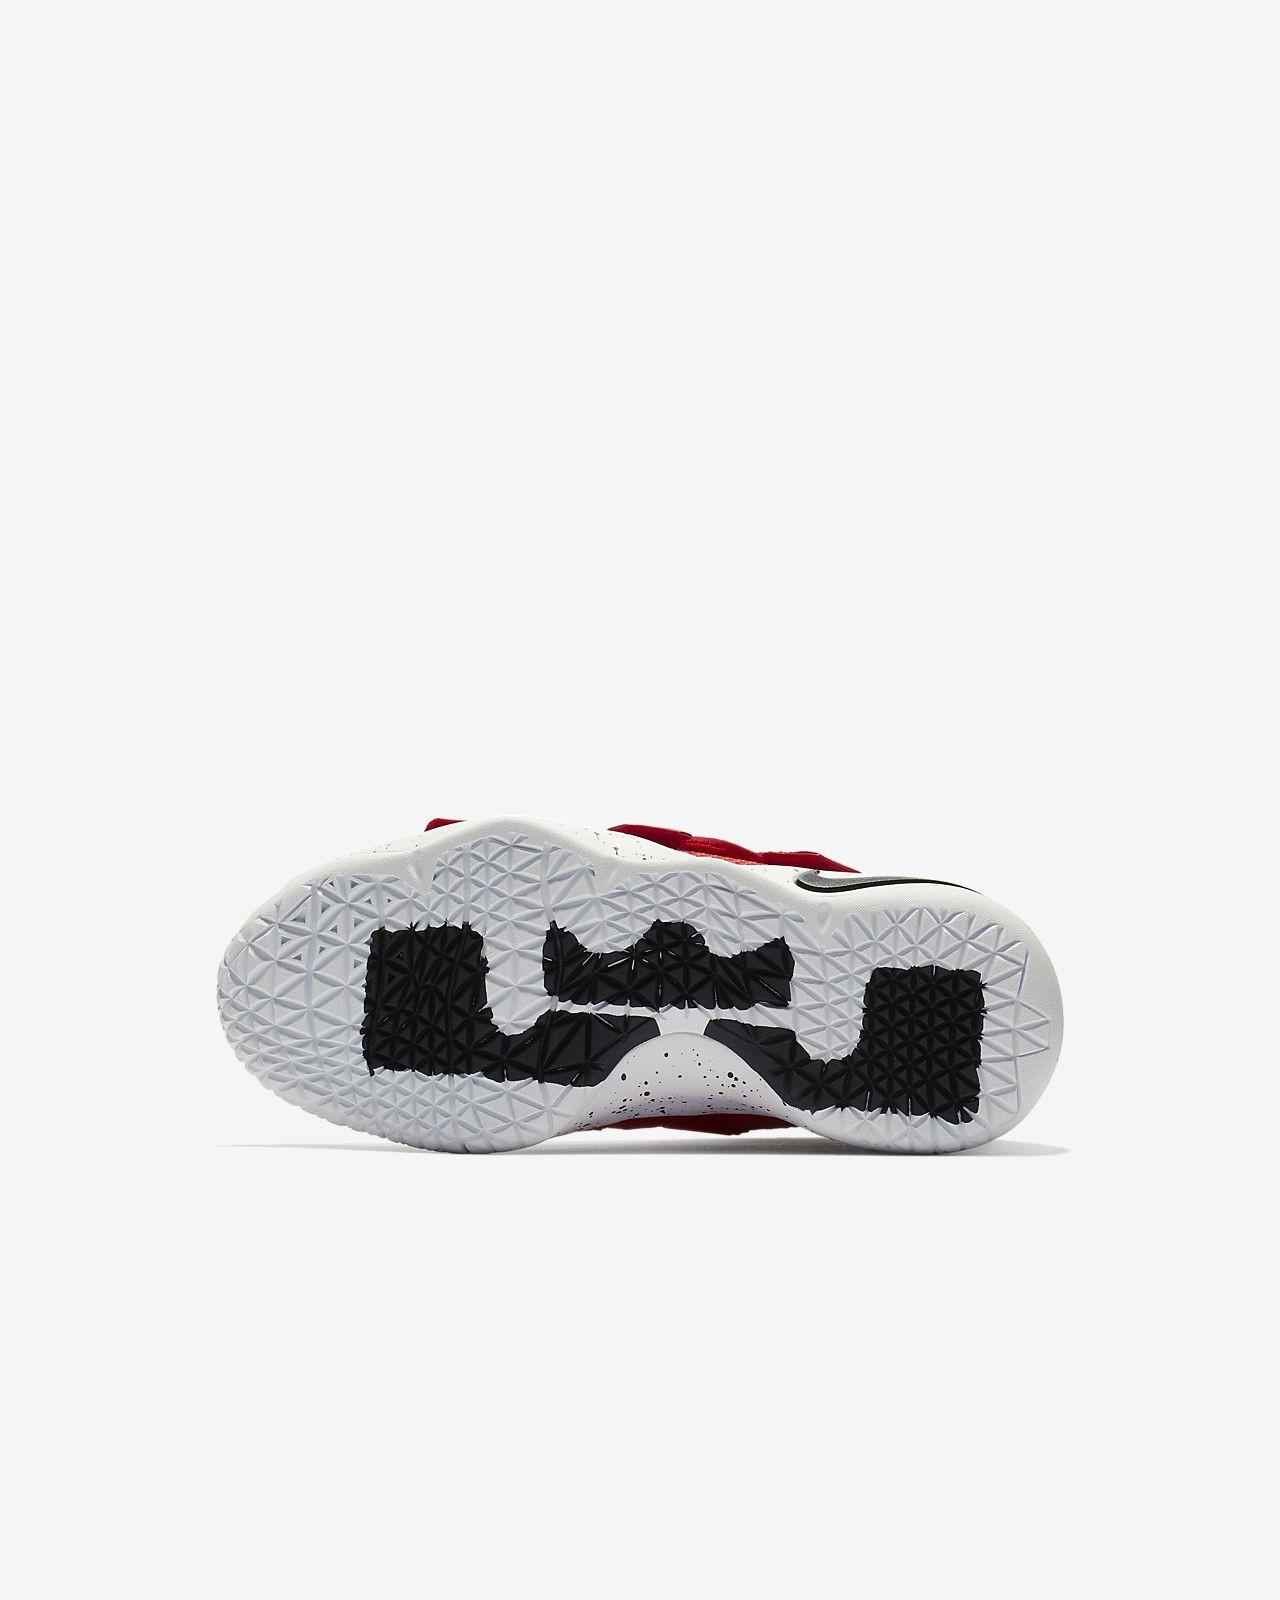 77c3e1d05ee1 Nike Lebron Soldier Xi Flyease Little Kids  Shoe - 10.5C